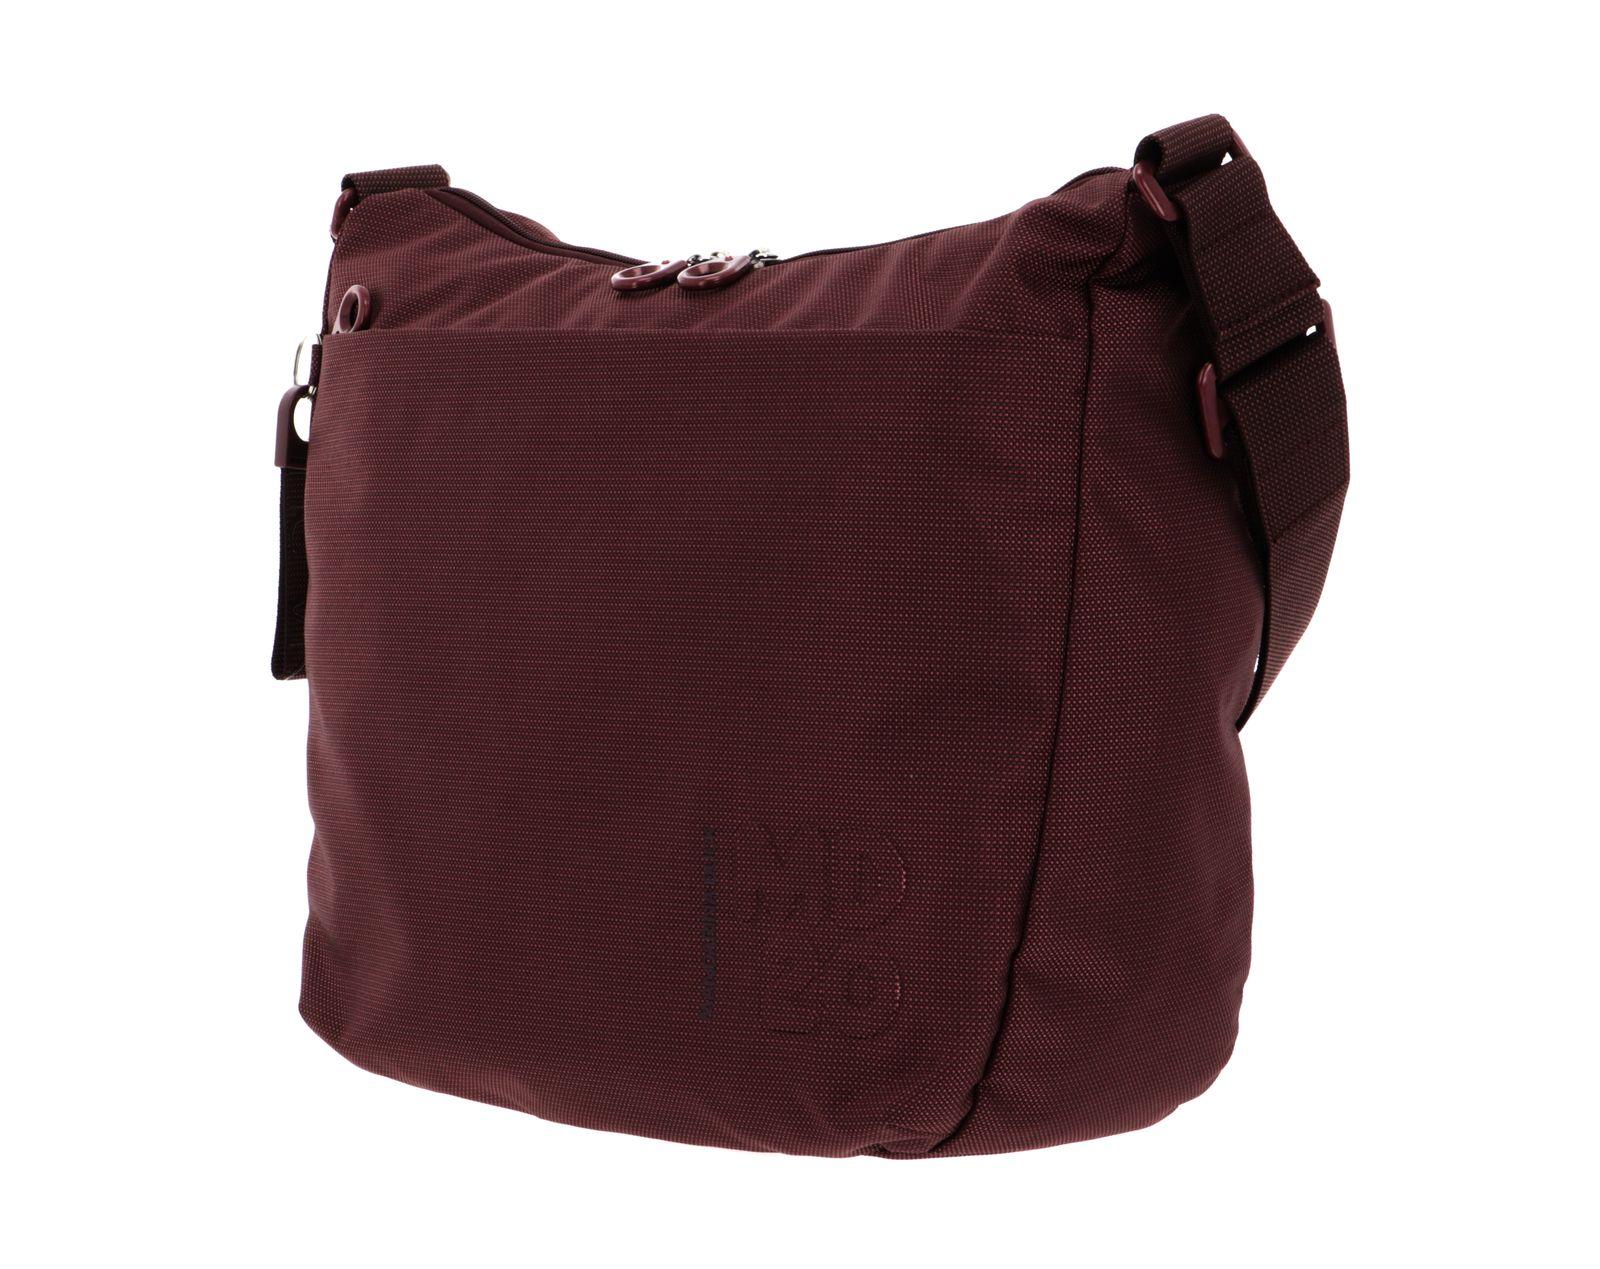 MANDARINA DUCK MD20 Hobo Bag Mahogany